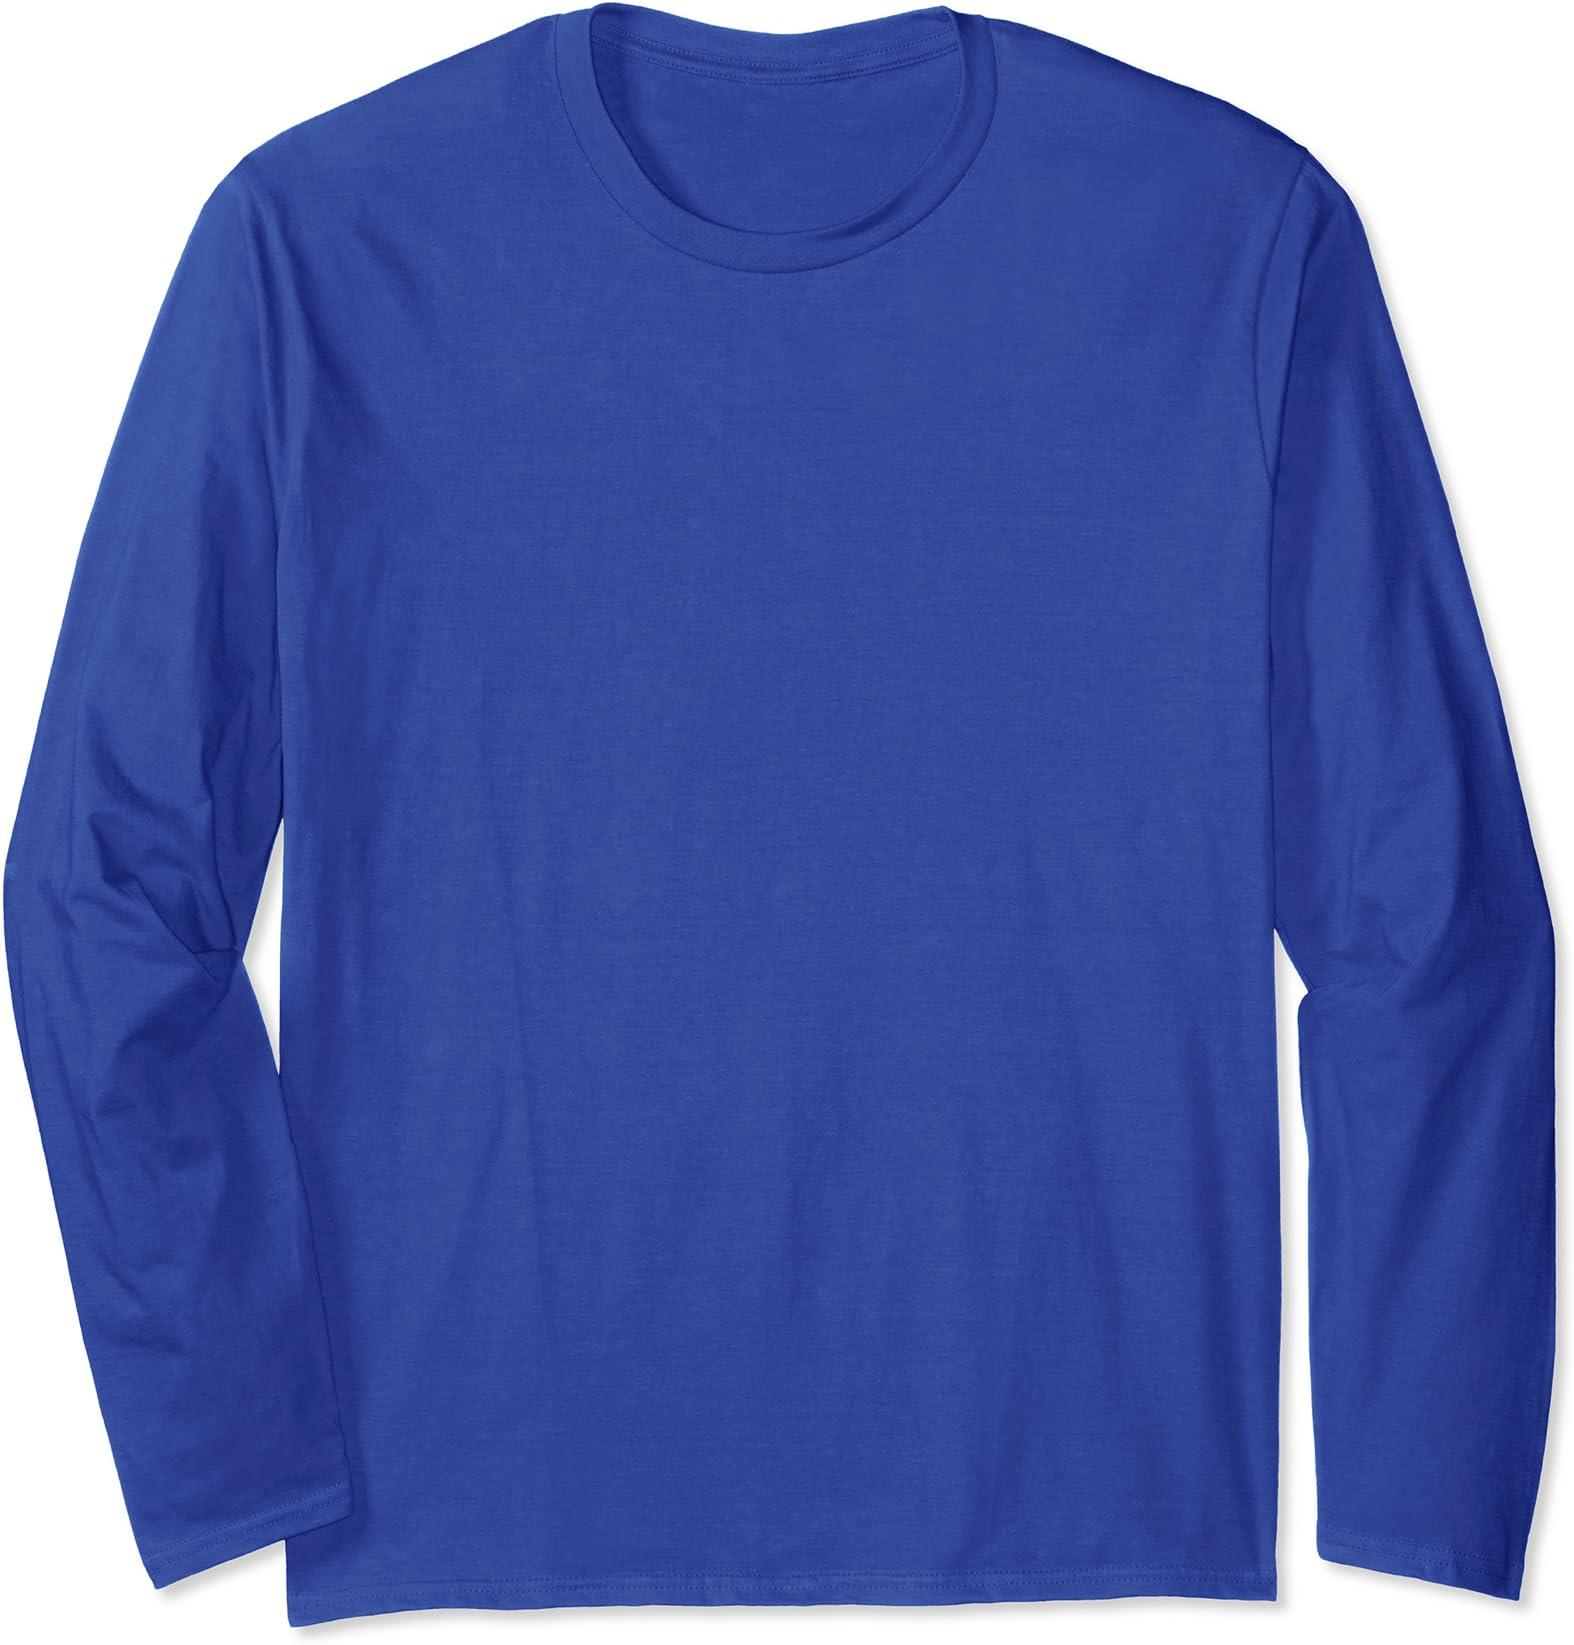 Mens Womens Unisex T shirt surf classic wave retro design summer fun